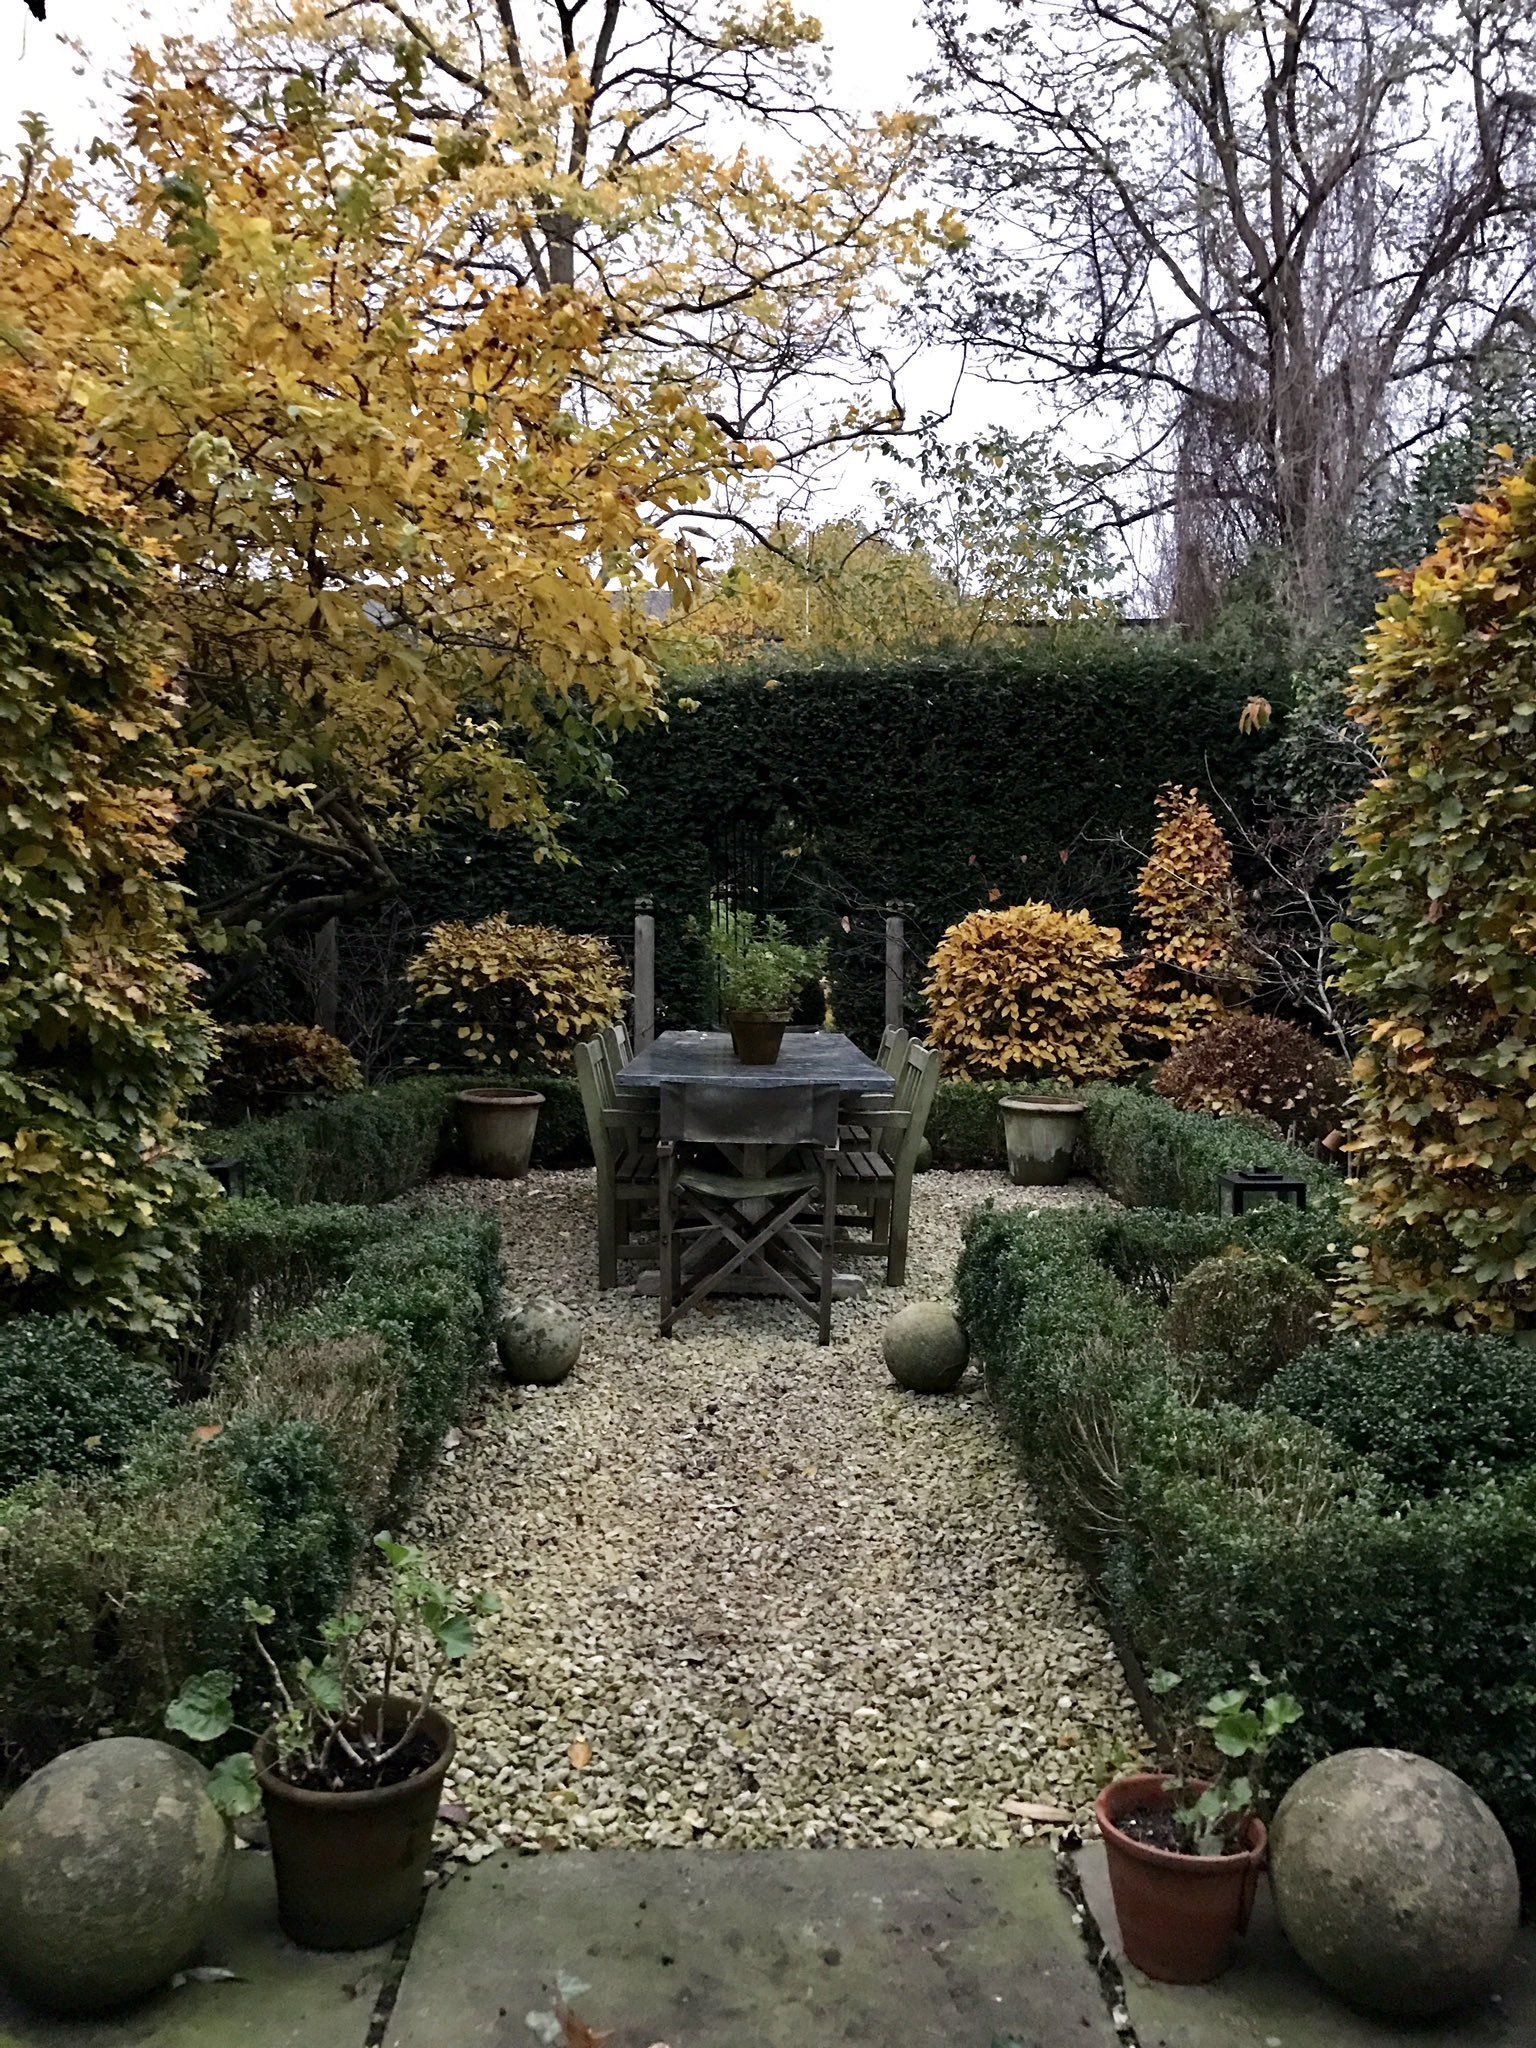 nigel slater on small cottage garden ideas backyard on backyard landscape architecture inspirations id=15041